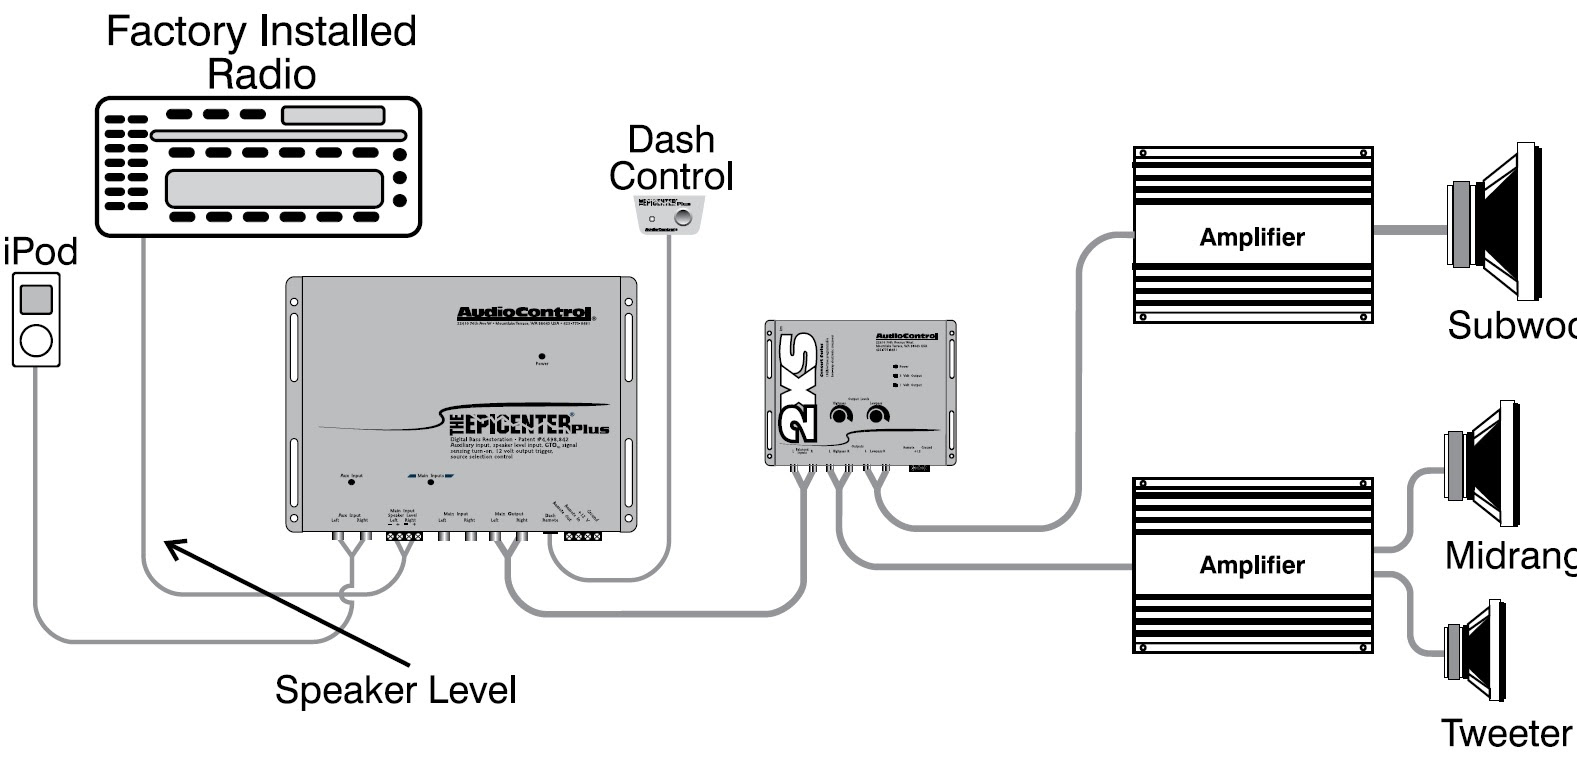 Pa Speaker Wiring Diagram from lh4.googleusercontent.com